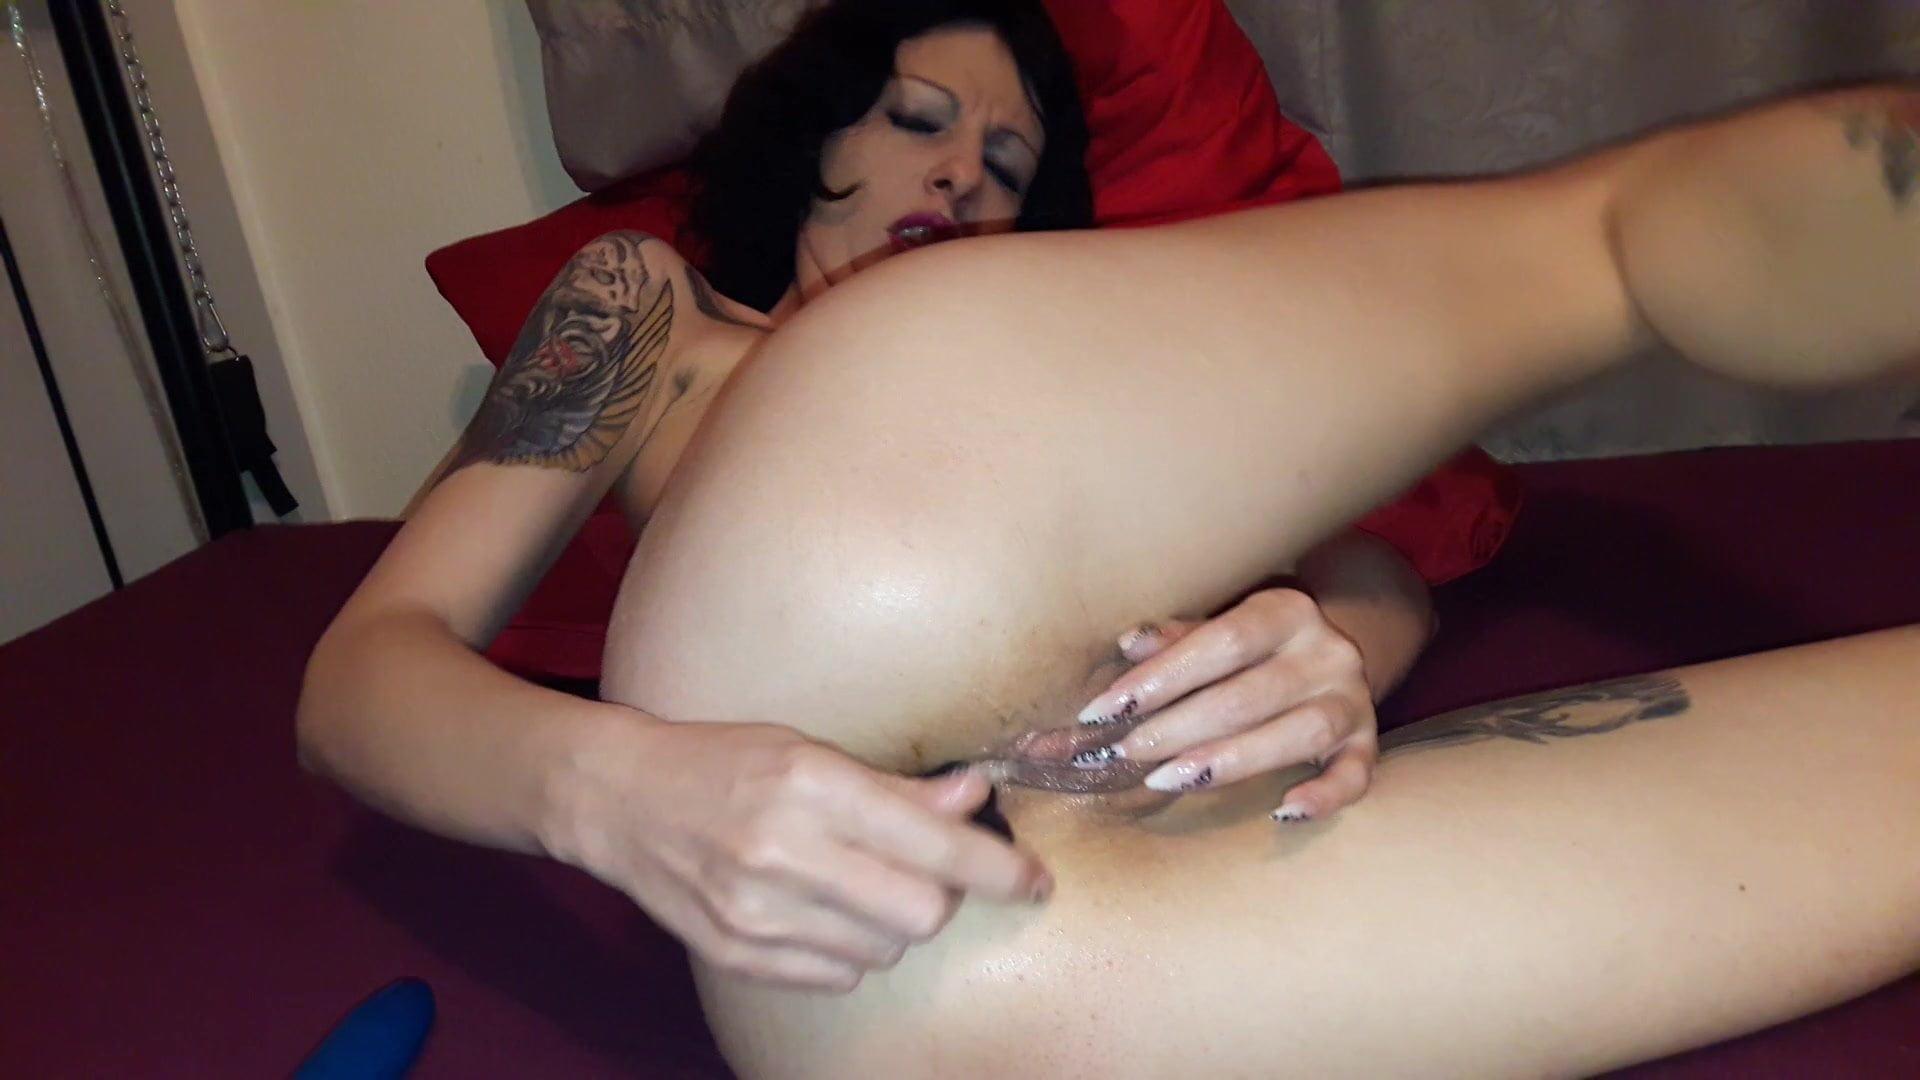 Erotic women and sex